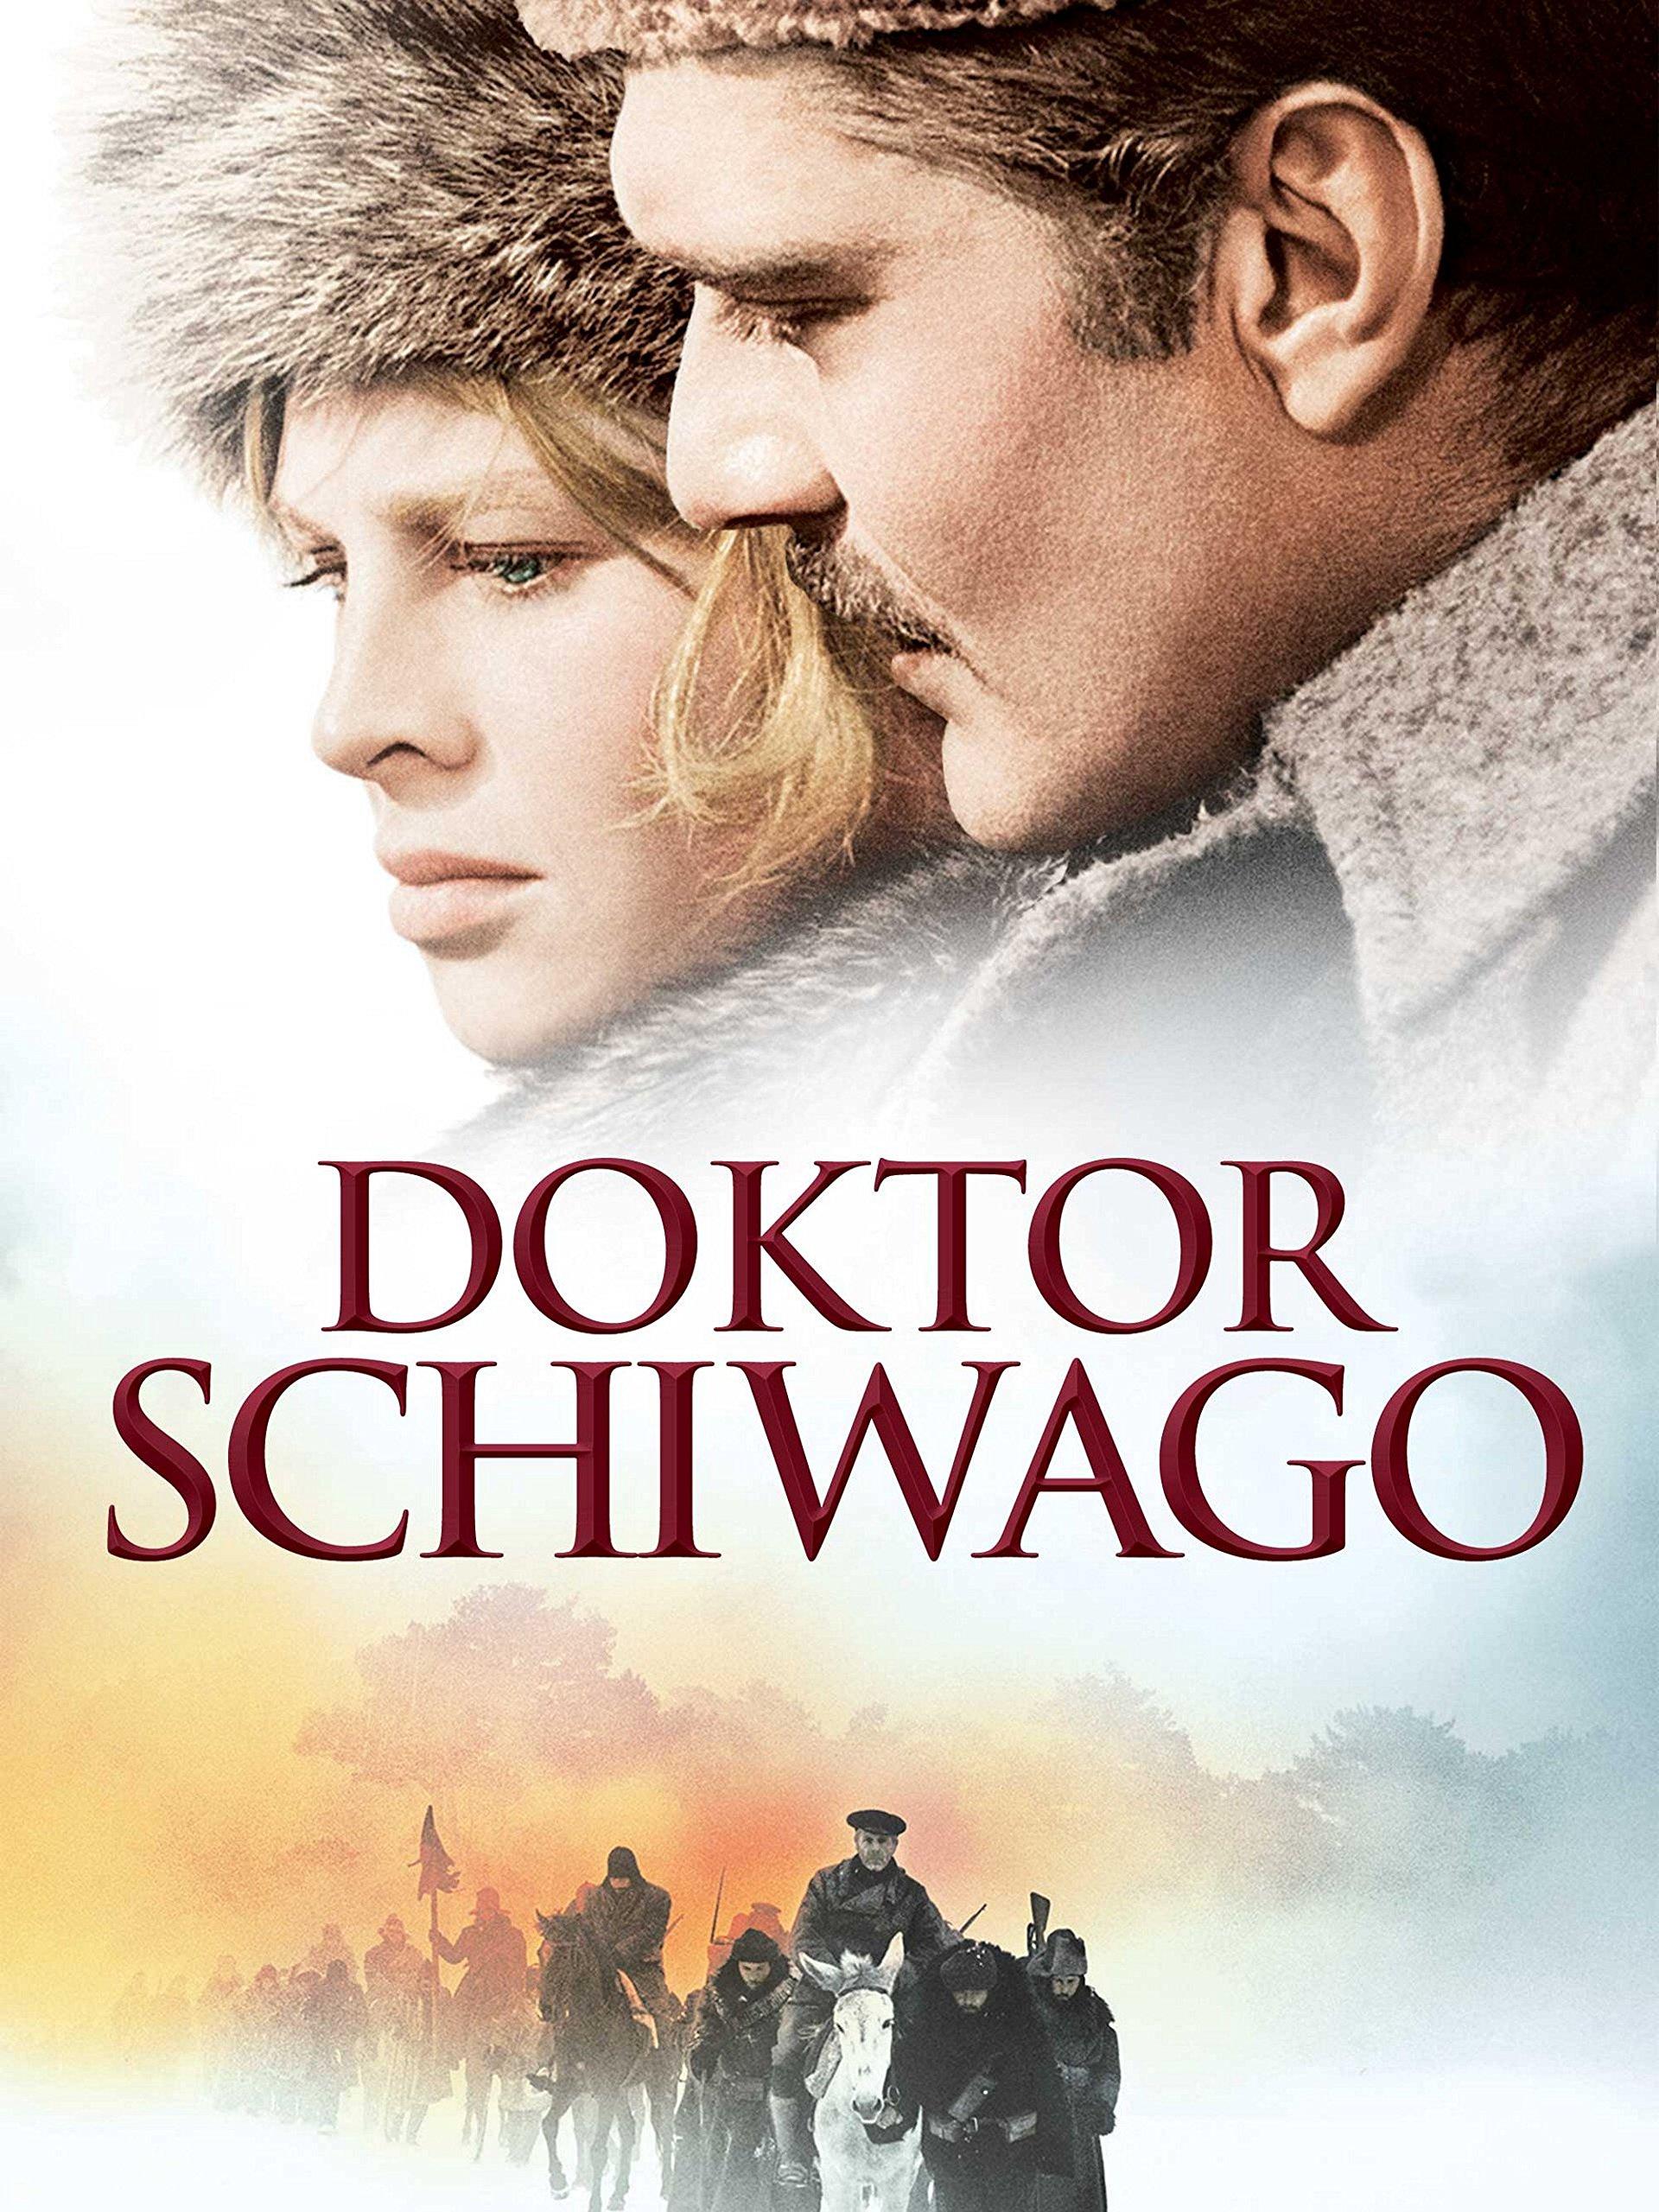 Schiwago Film